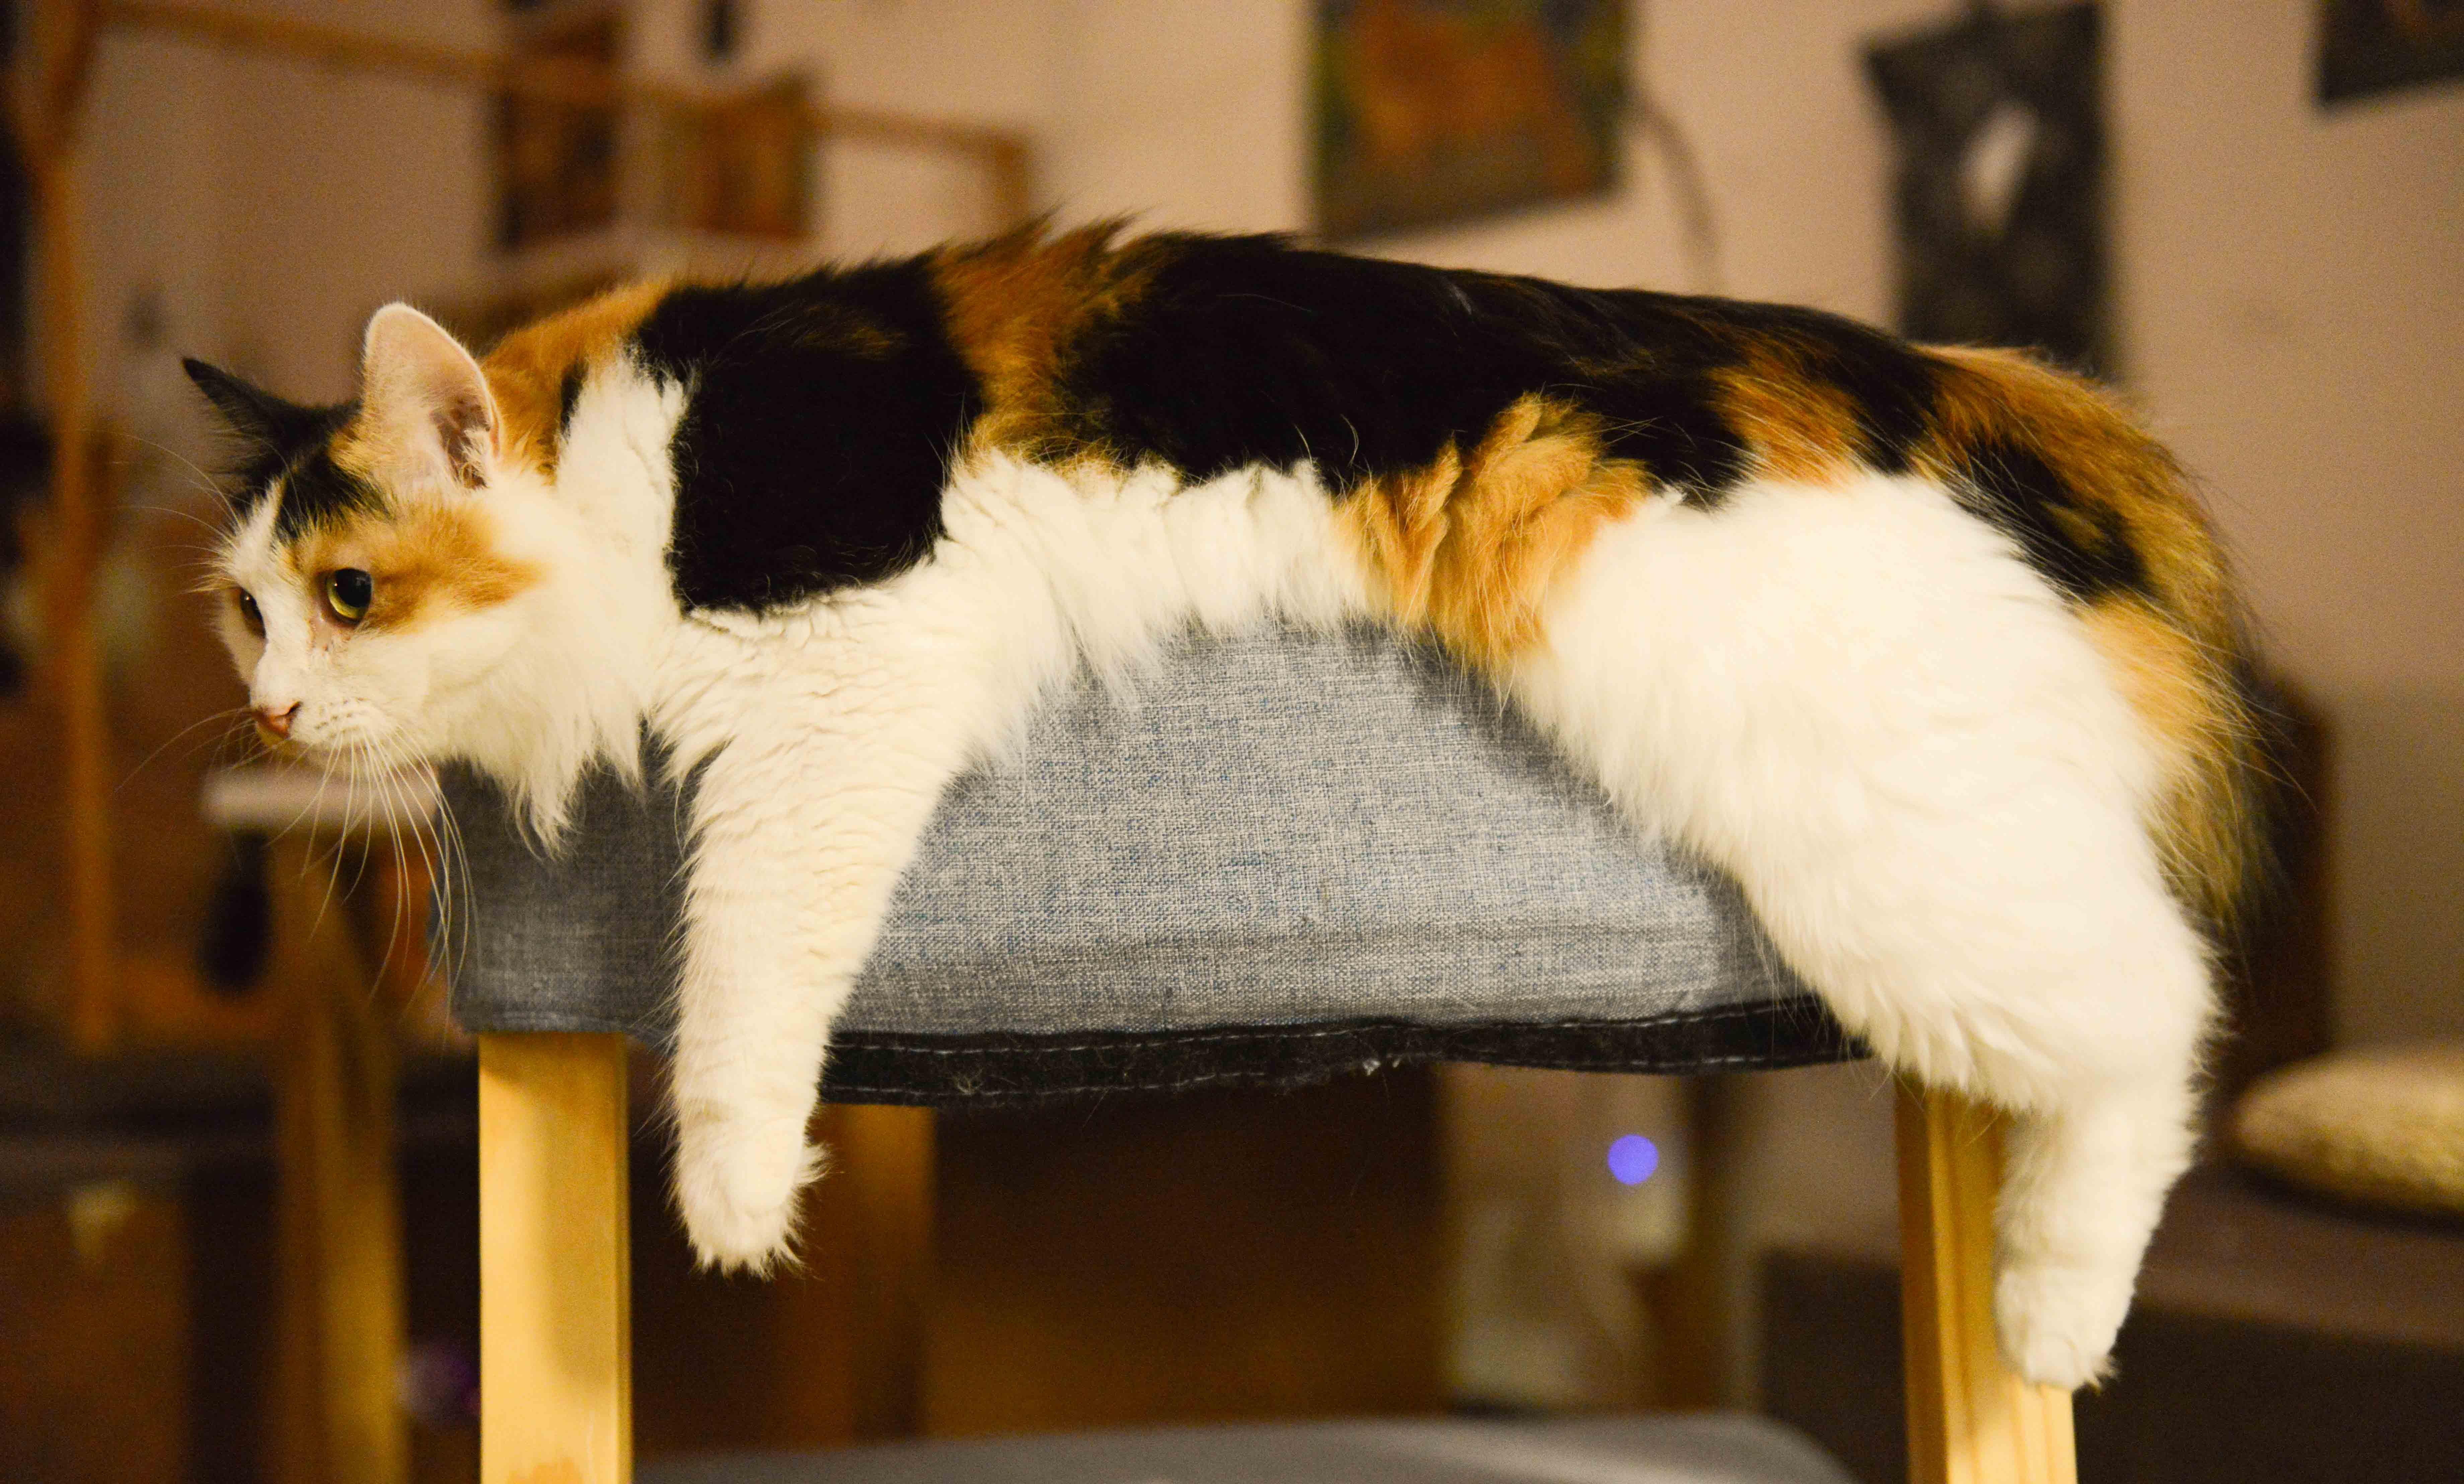 Cat Cute Wallpaper Download Himalayan Cat Sitting On Orange Sofa Chair During Daytime